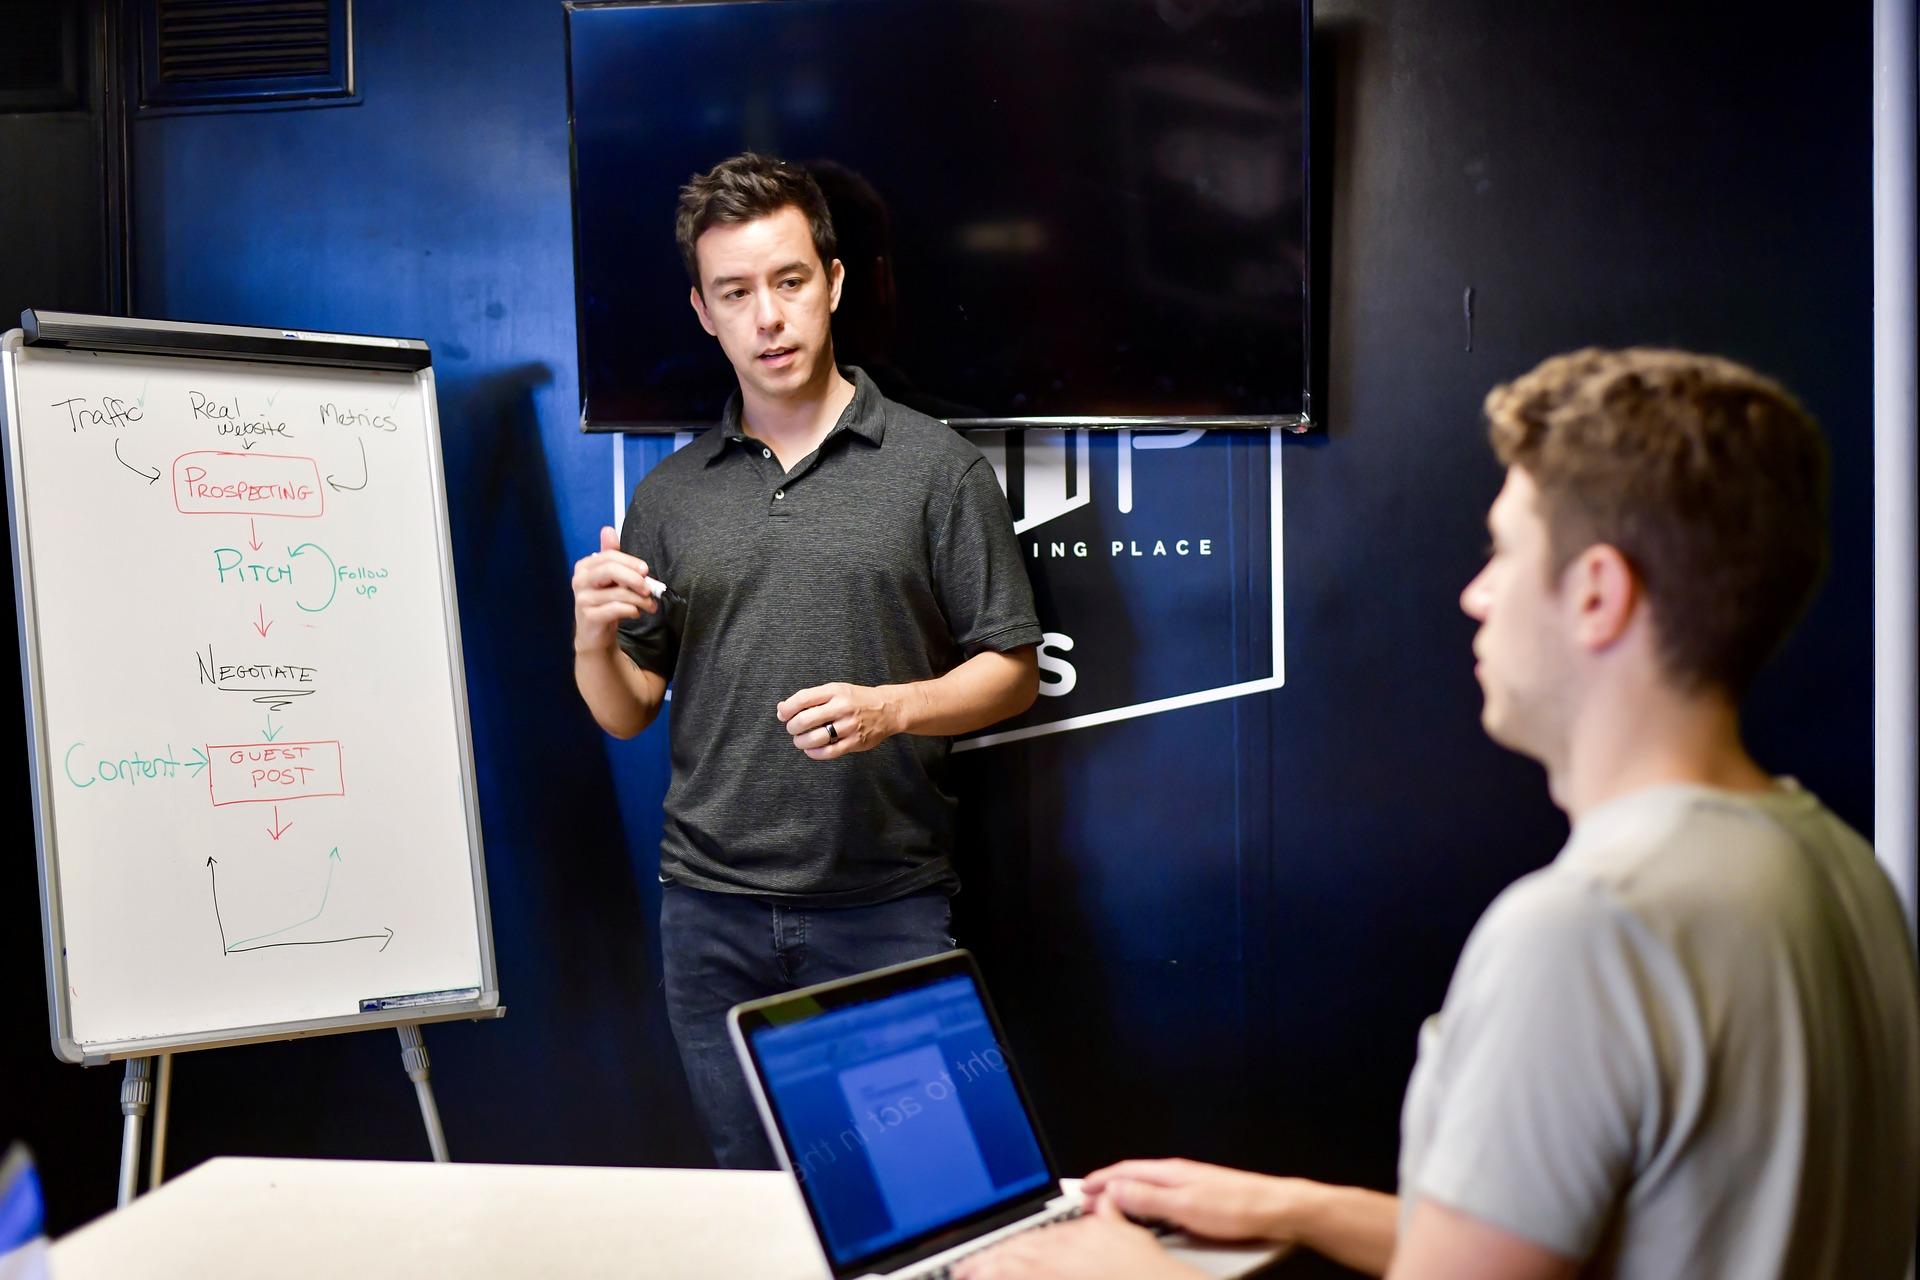 career / business planning, coaching, advising